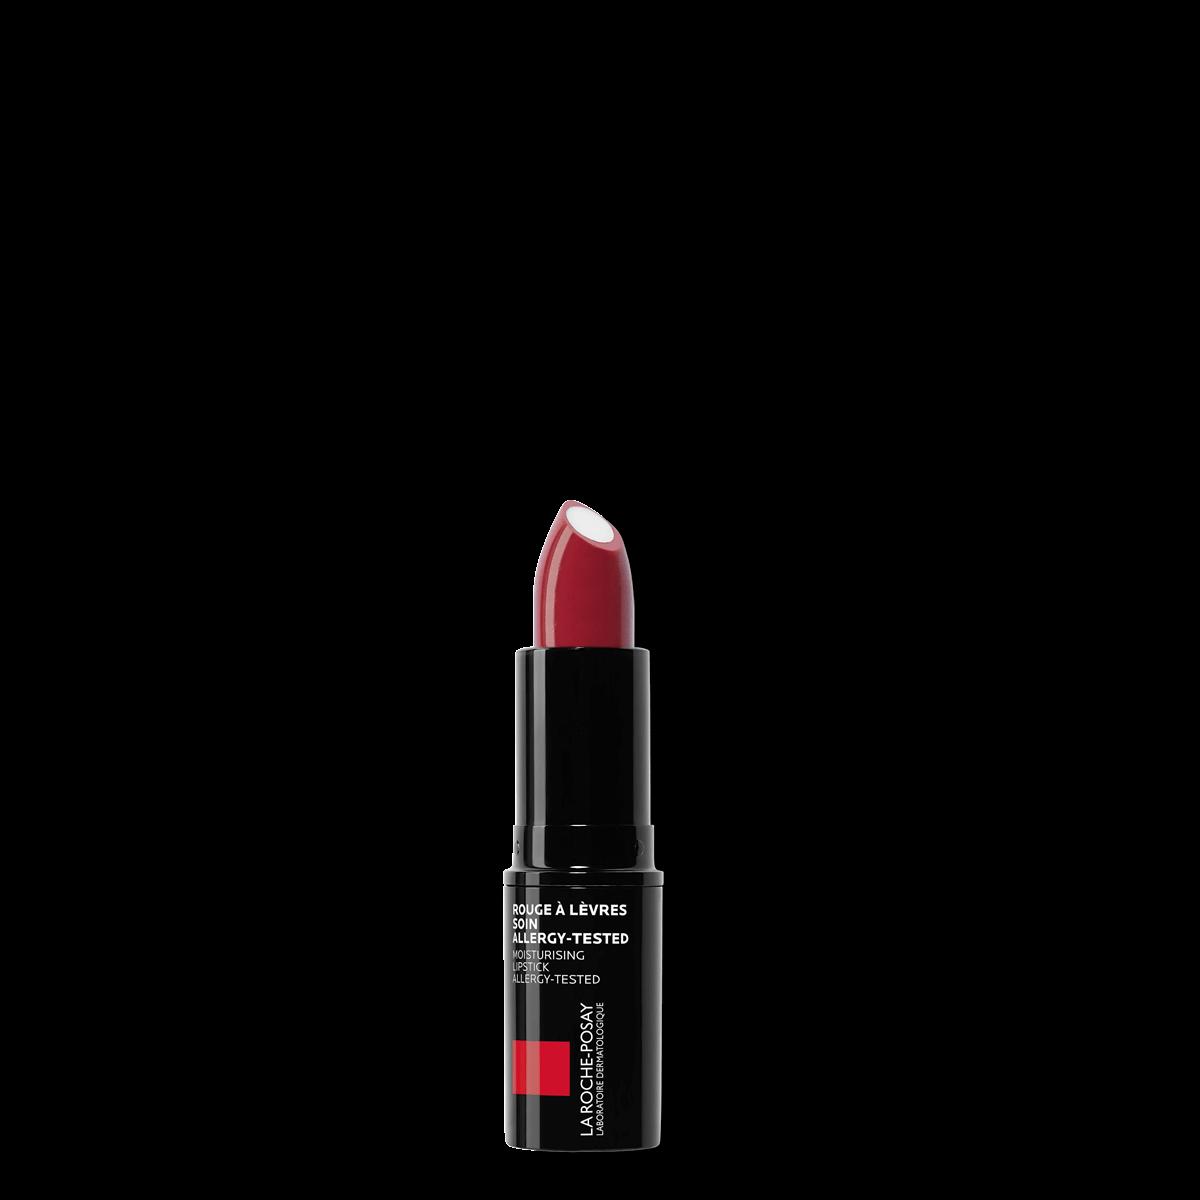 La Roche Posay Sensitiv Toleriane Makeup NOVALIP 158Cassisnocturne 3